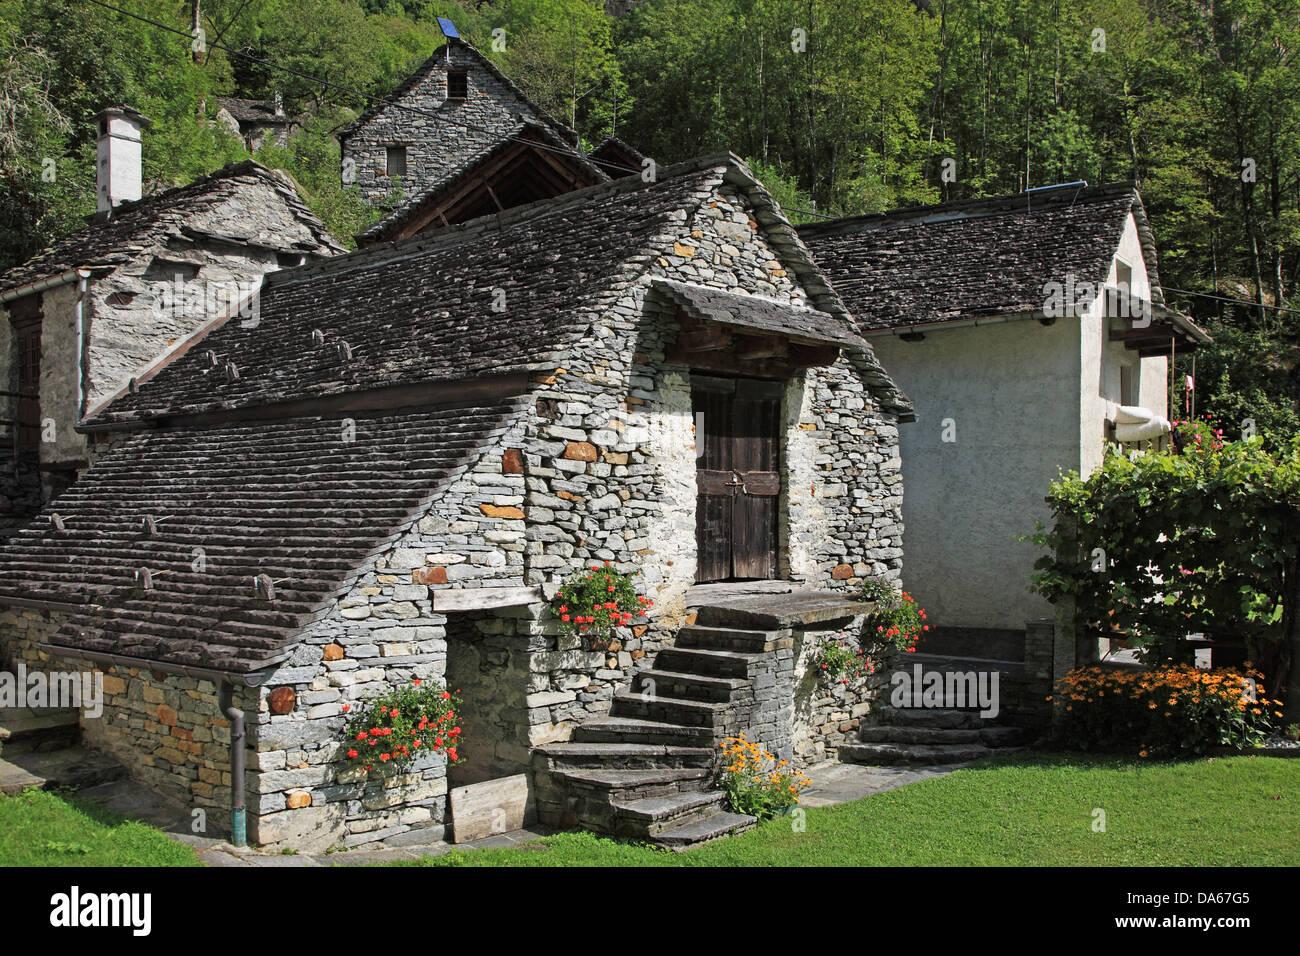 Switzerland, Europe, Canton, Ticino, Bavona Valley, Ritorto, Travel, Geography, Village, Stone, House, Swiss, Tranquil, - Stock Image